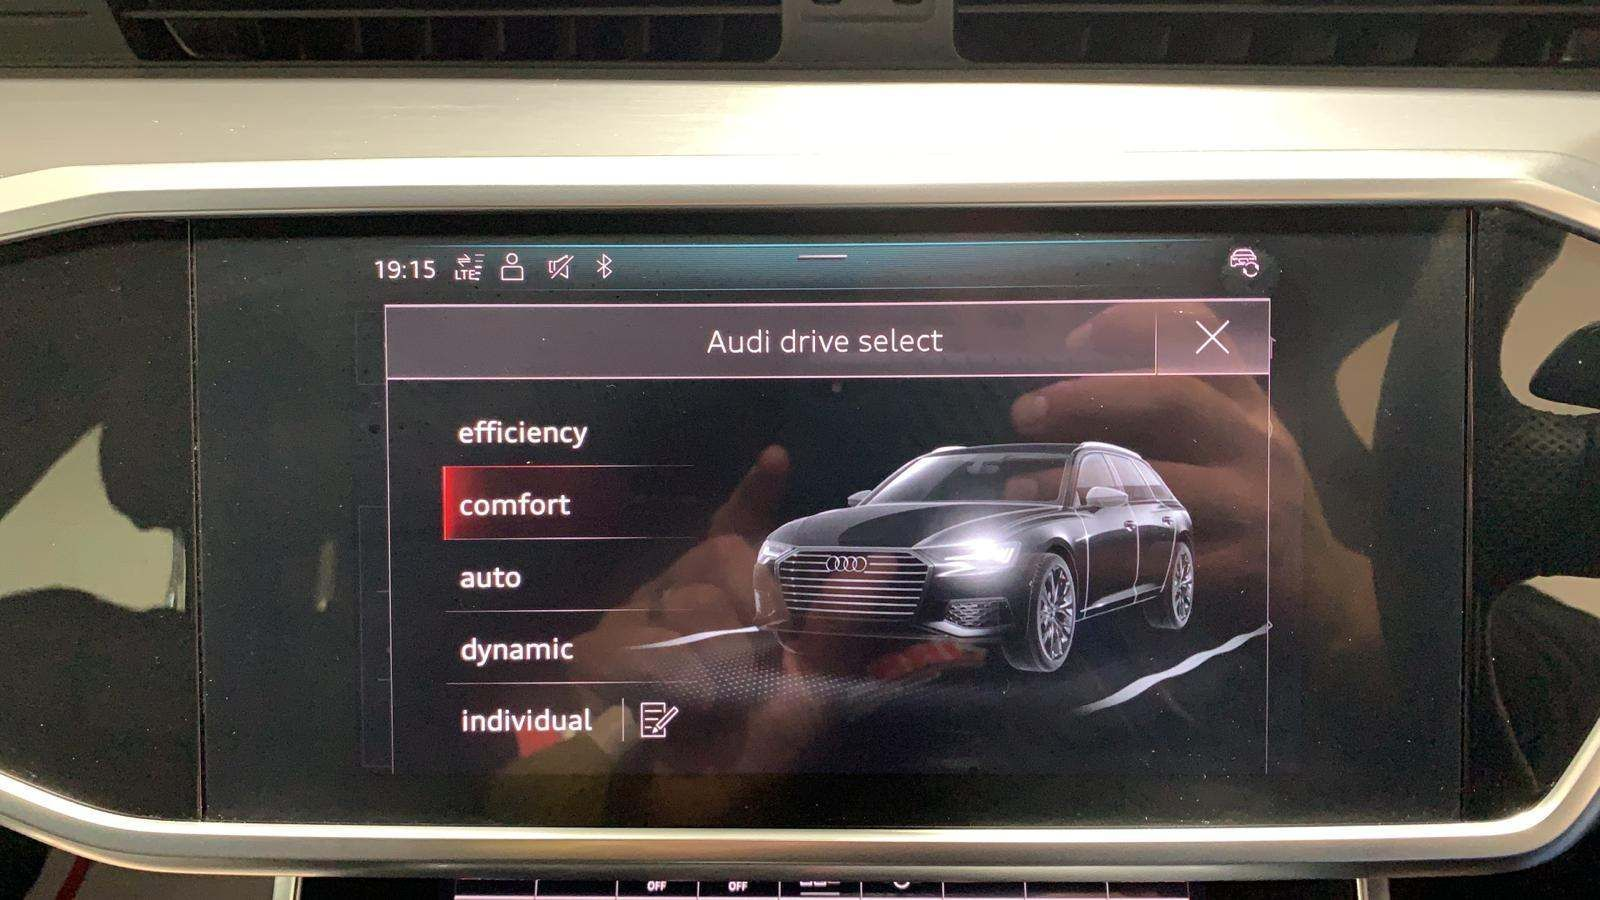 2019 AUDI A6 Avant 2.0 TDI 40 S line Avant S Tronic (s/s) Diesel Automatic Audi Warranty Expires 31/05/22 – J R S Commercials And Cars Dungannon full